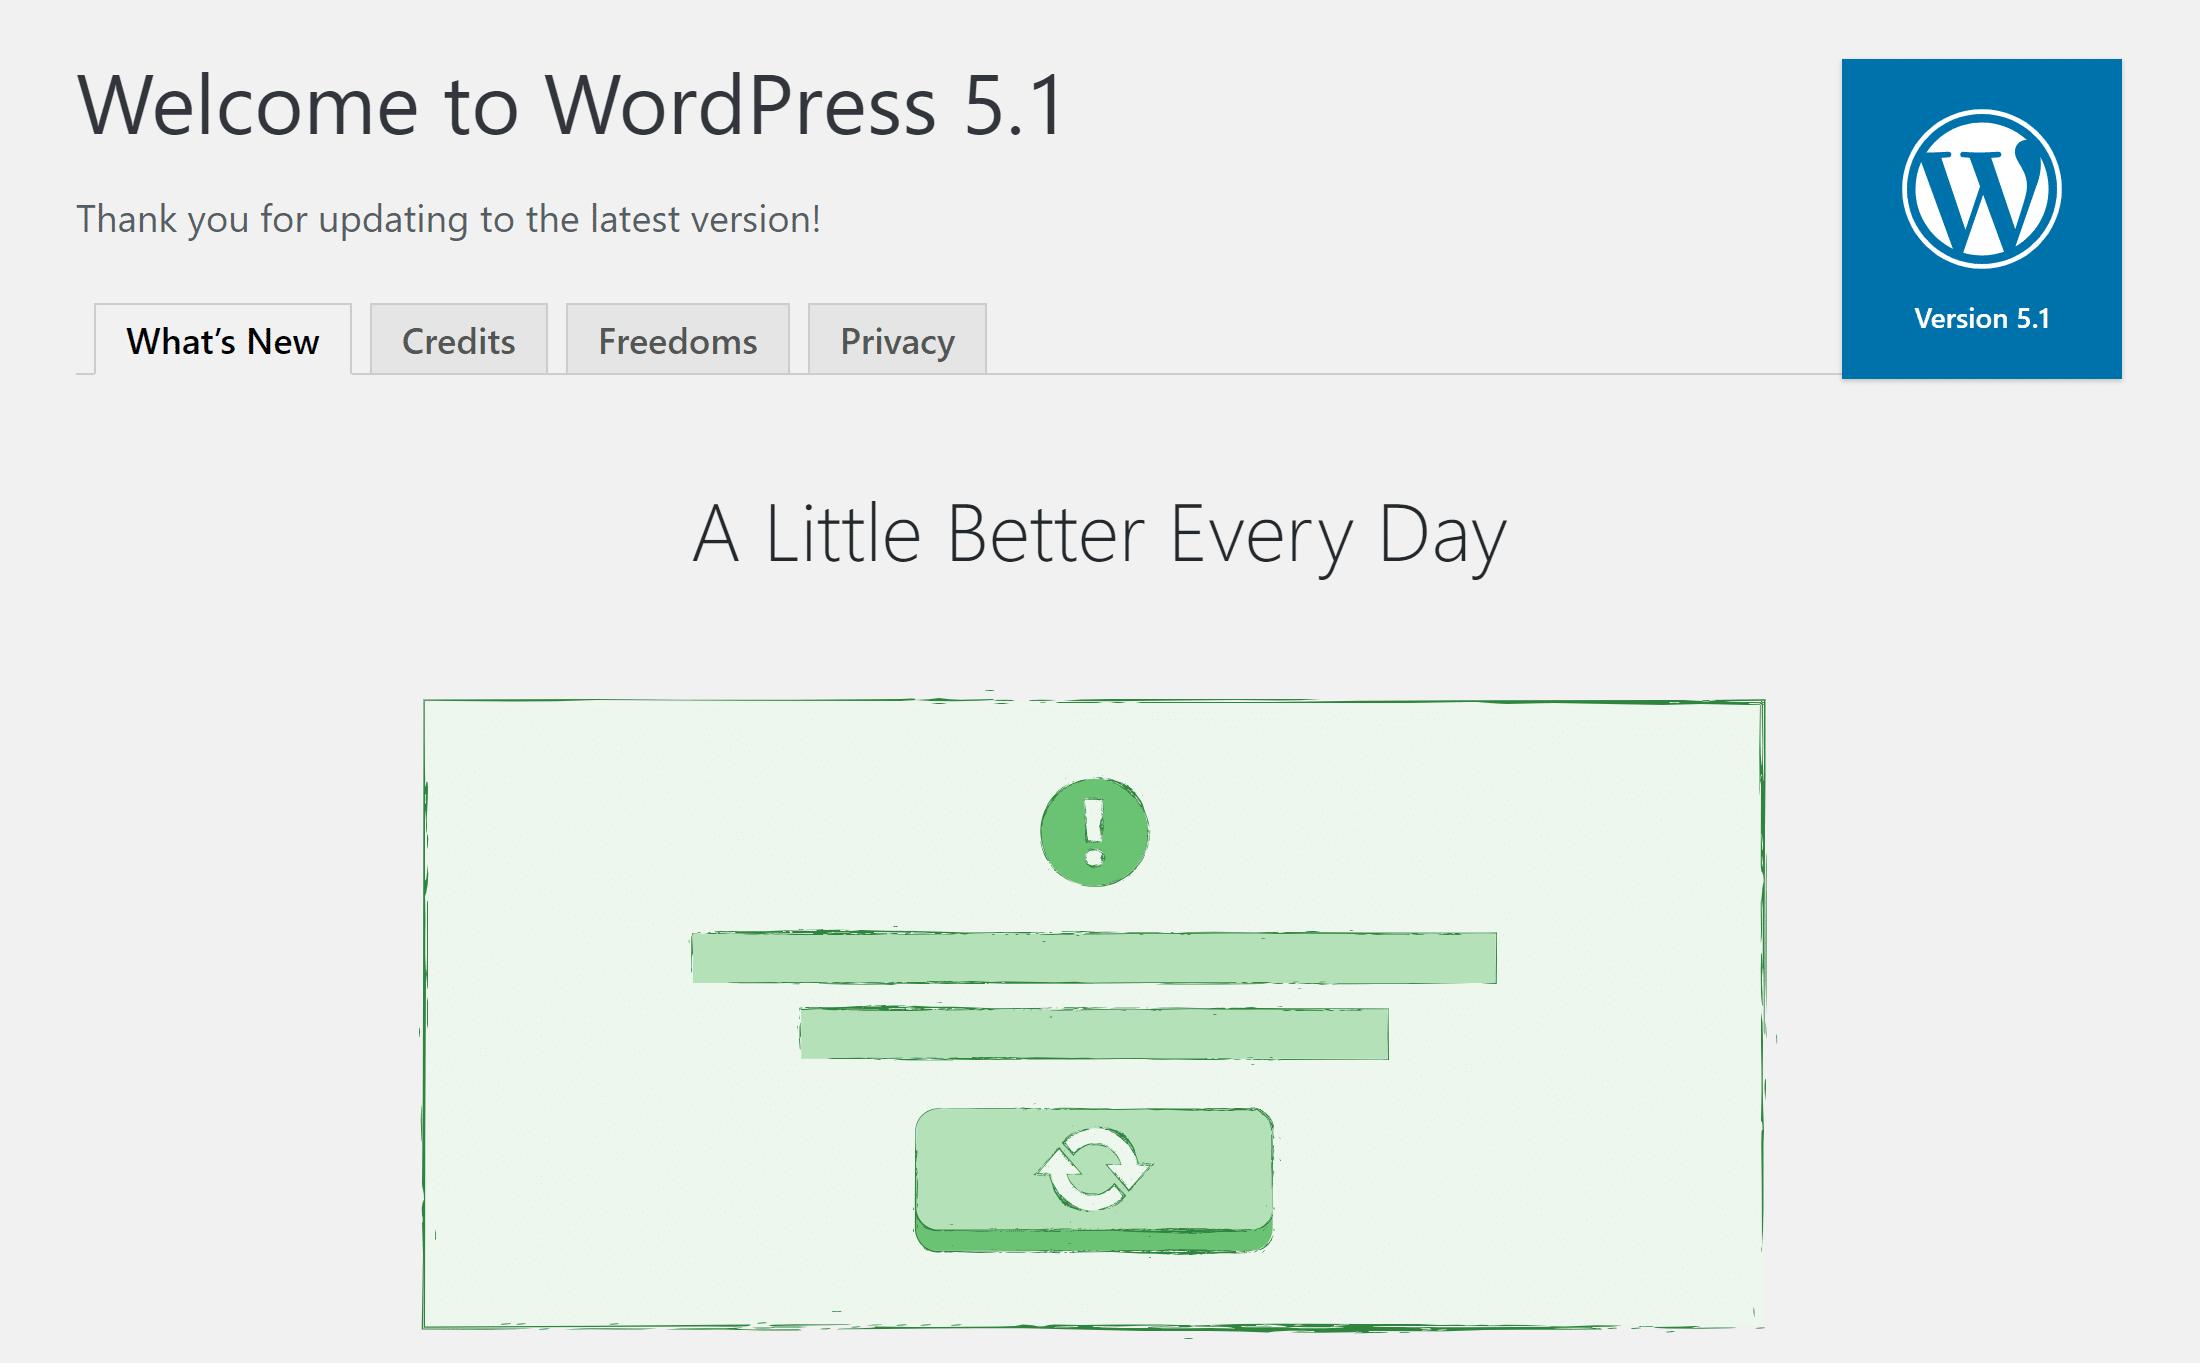 -La pantalla de bienvenida de WordPress 5.1